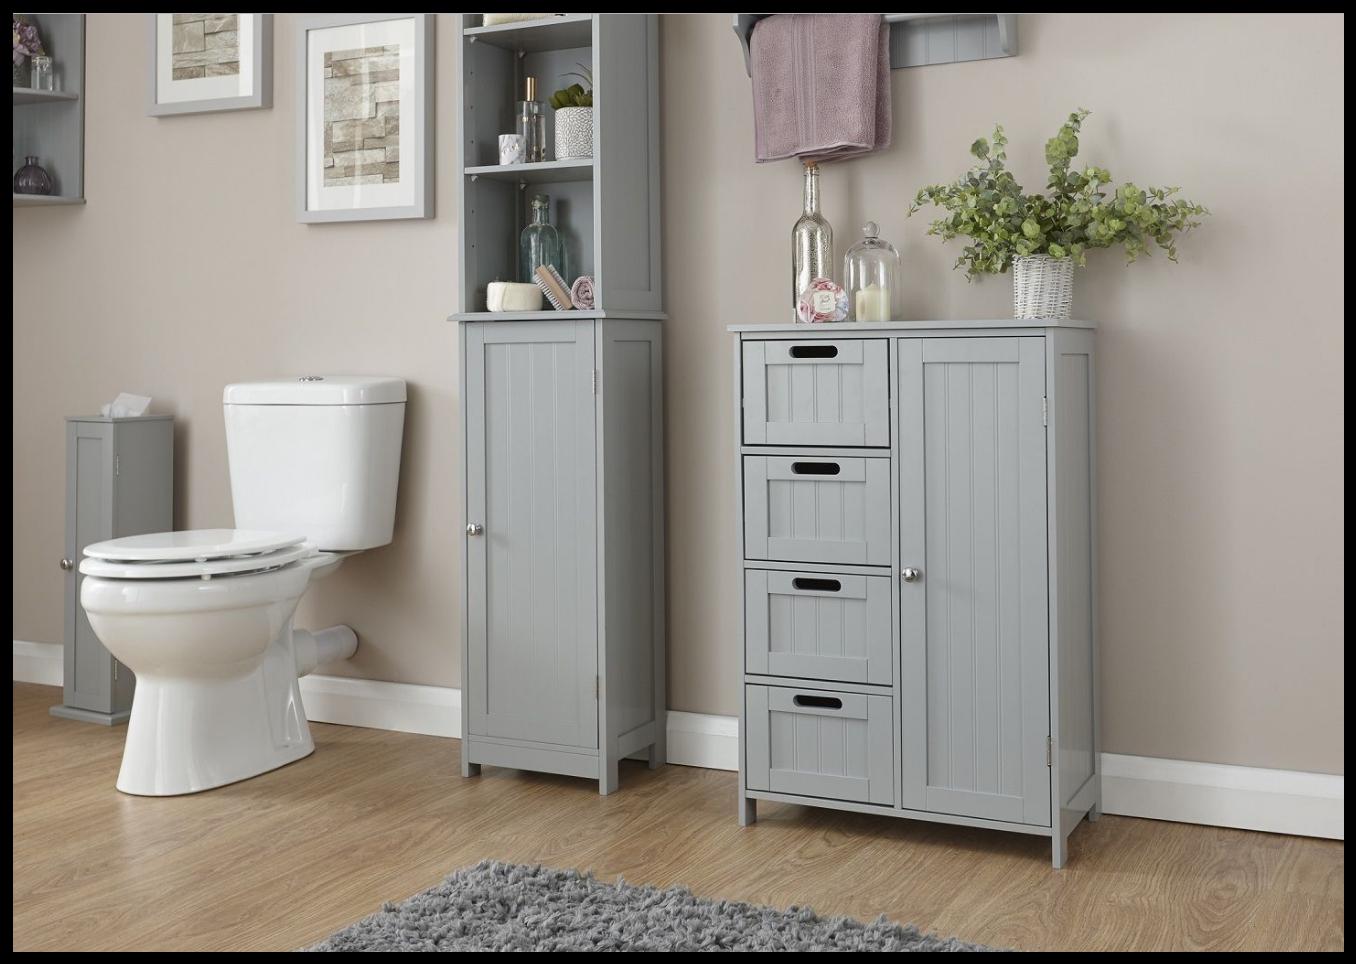 Vintage Bathroom Furniture Storage Faucet Ideas Site